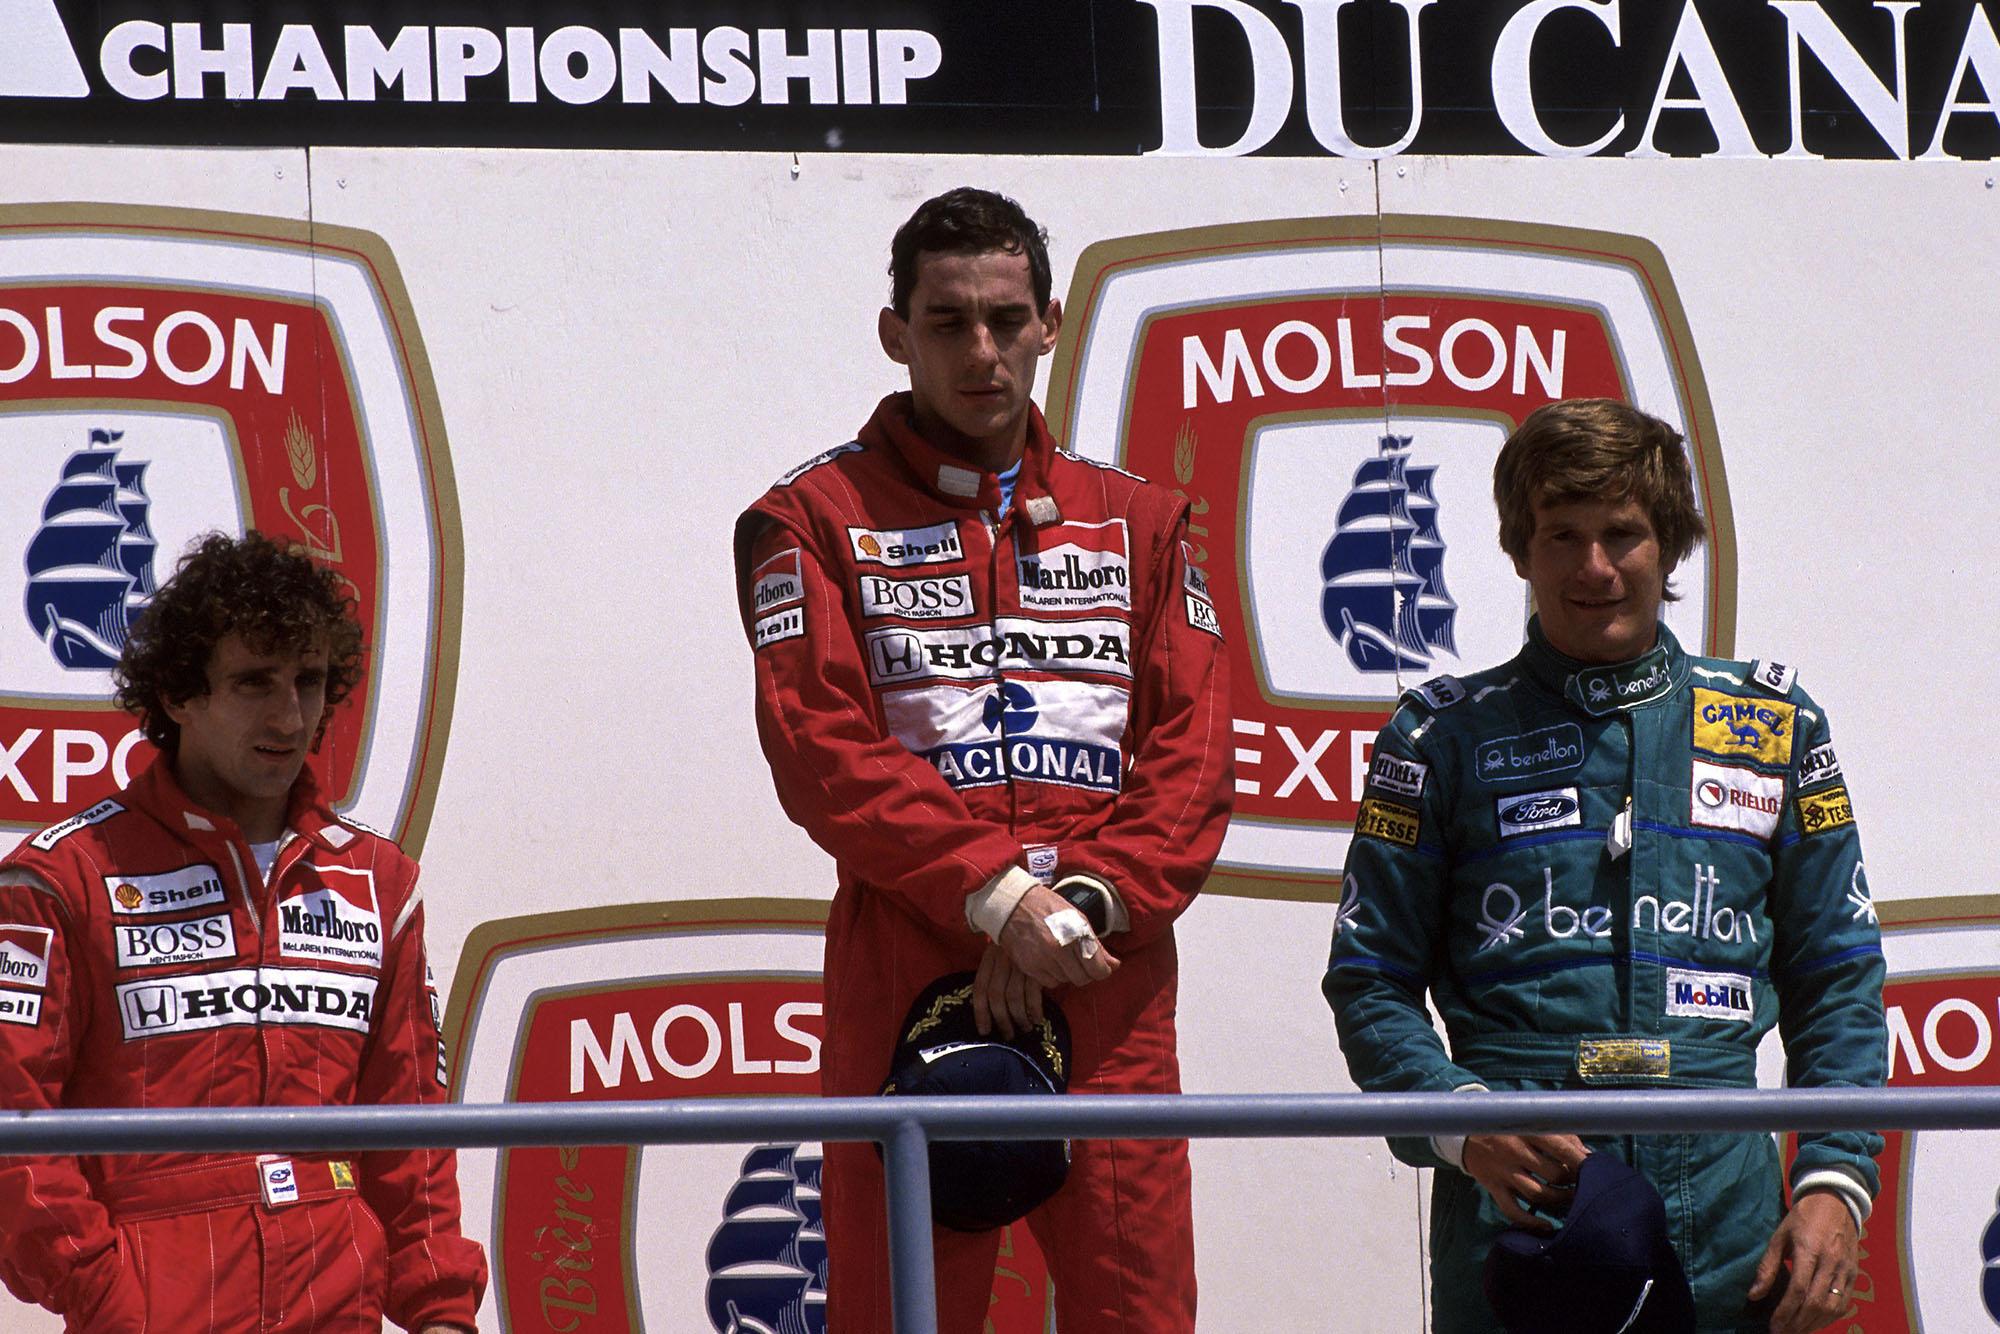 1988 CAN GP podium